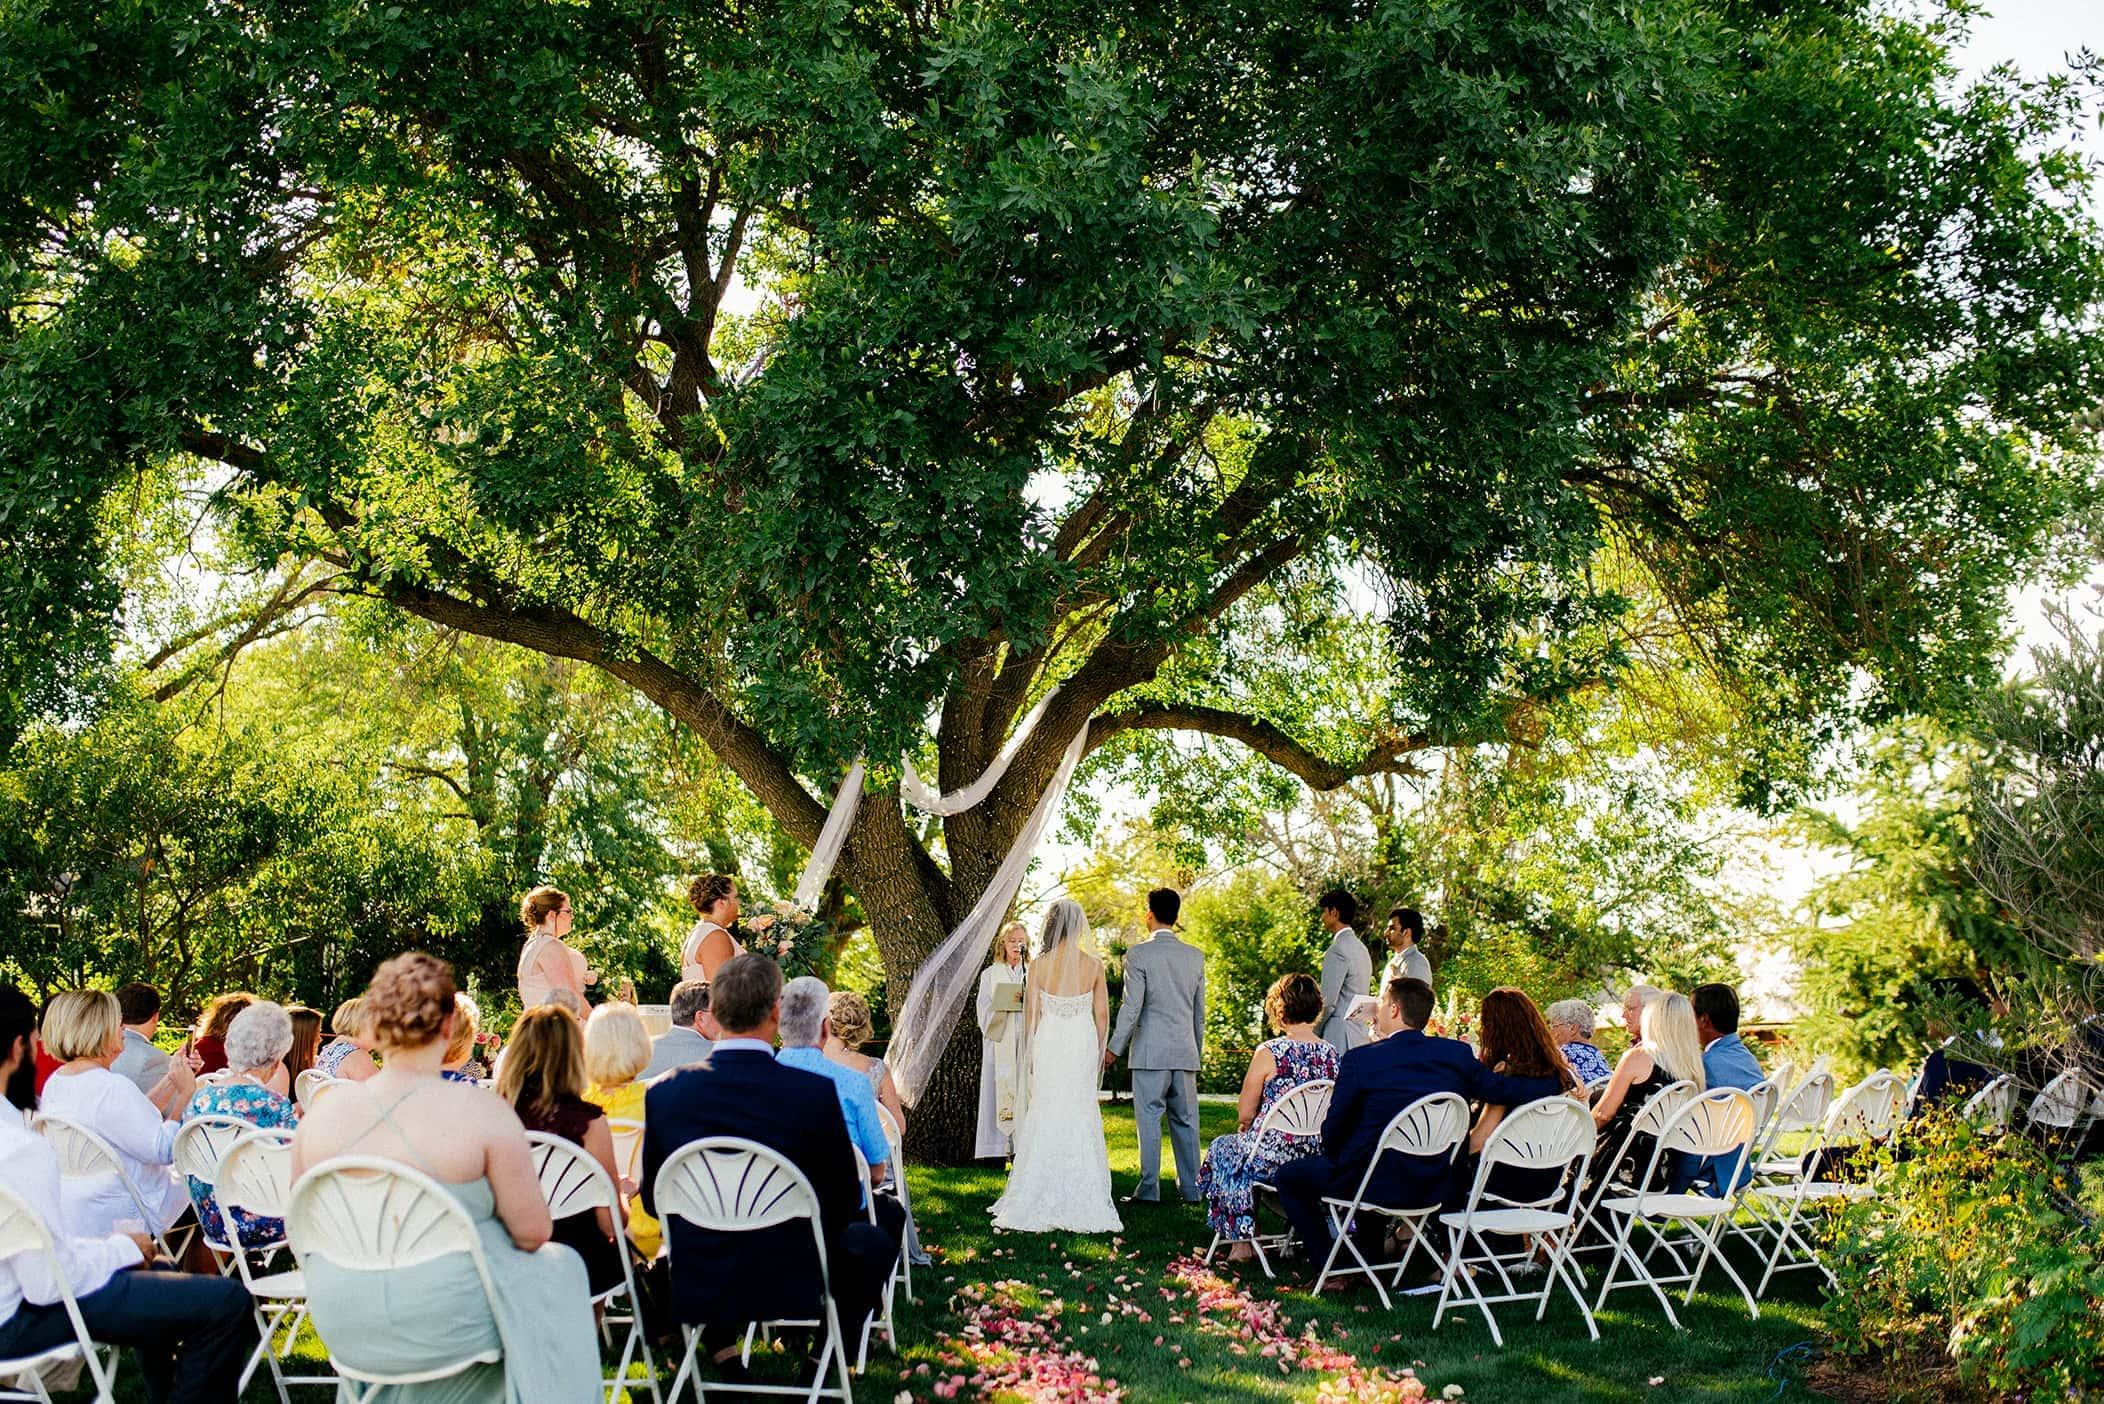 Keller Brick Barn wedding photos